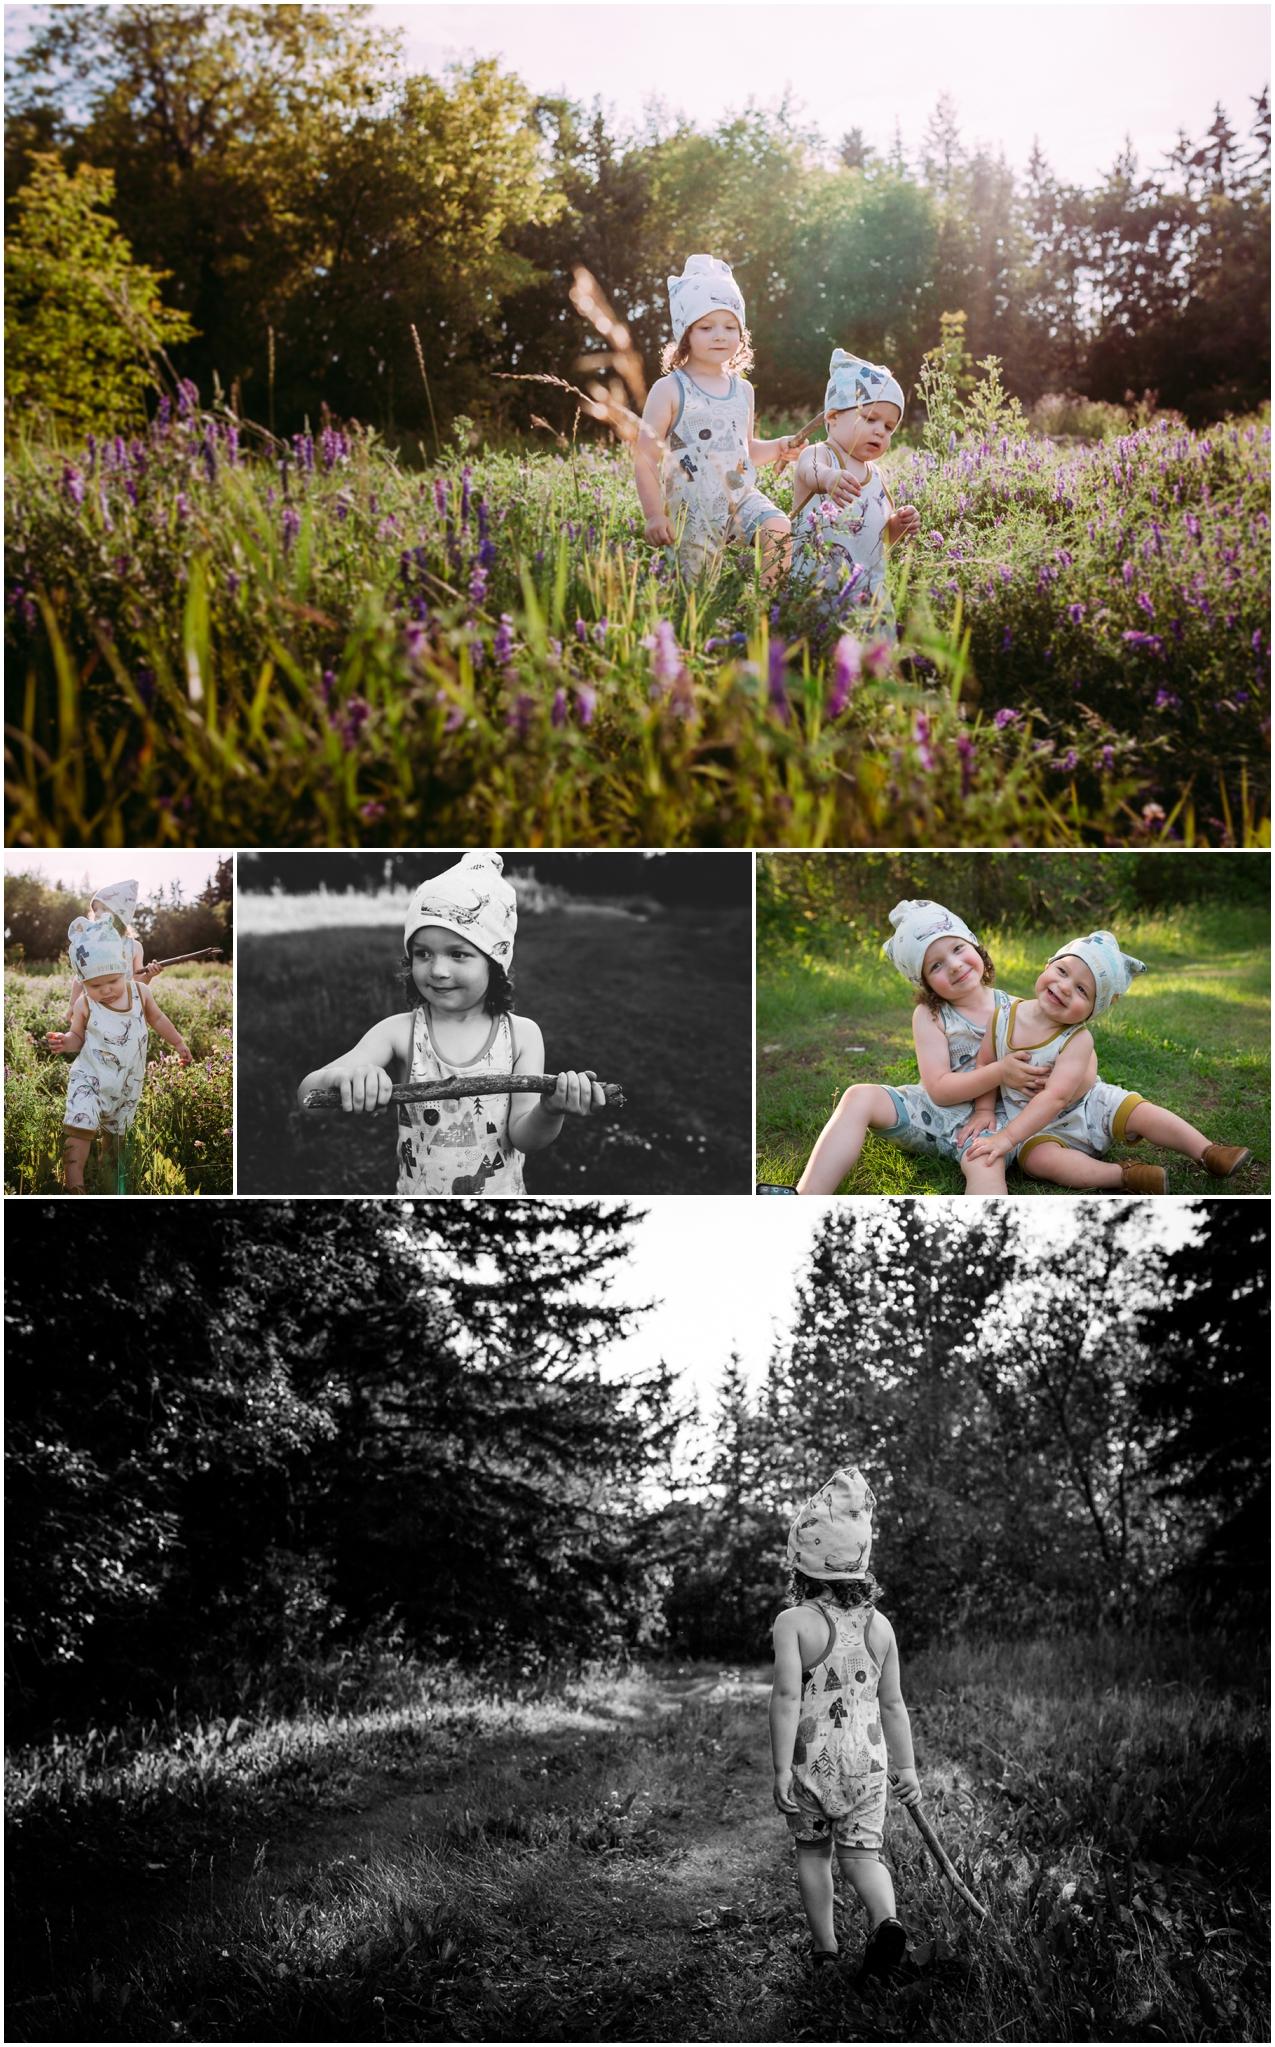 Edmonton Lifestyle Photography - Best of 2016 - Brothers - Summer - Olive Me Handmade